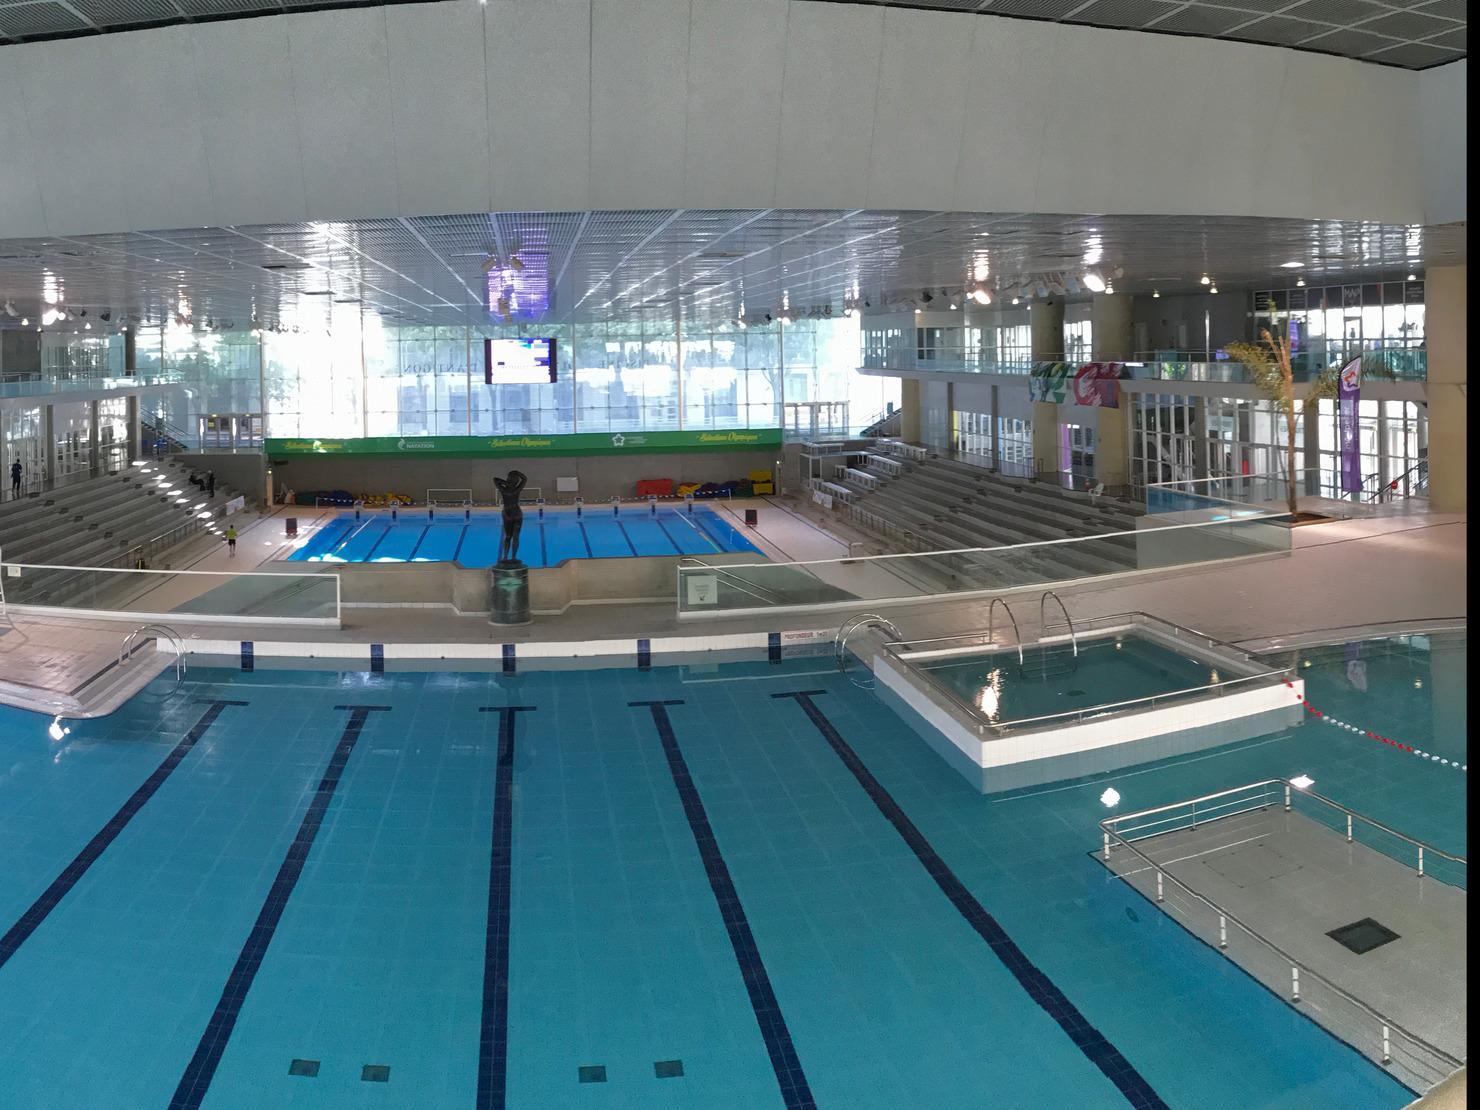 Vit 39 halles club montpellier tarifs avis horaires - Horaire piscine olympique ...